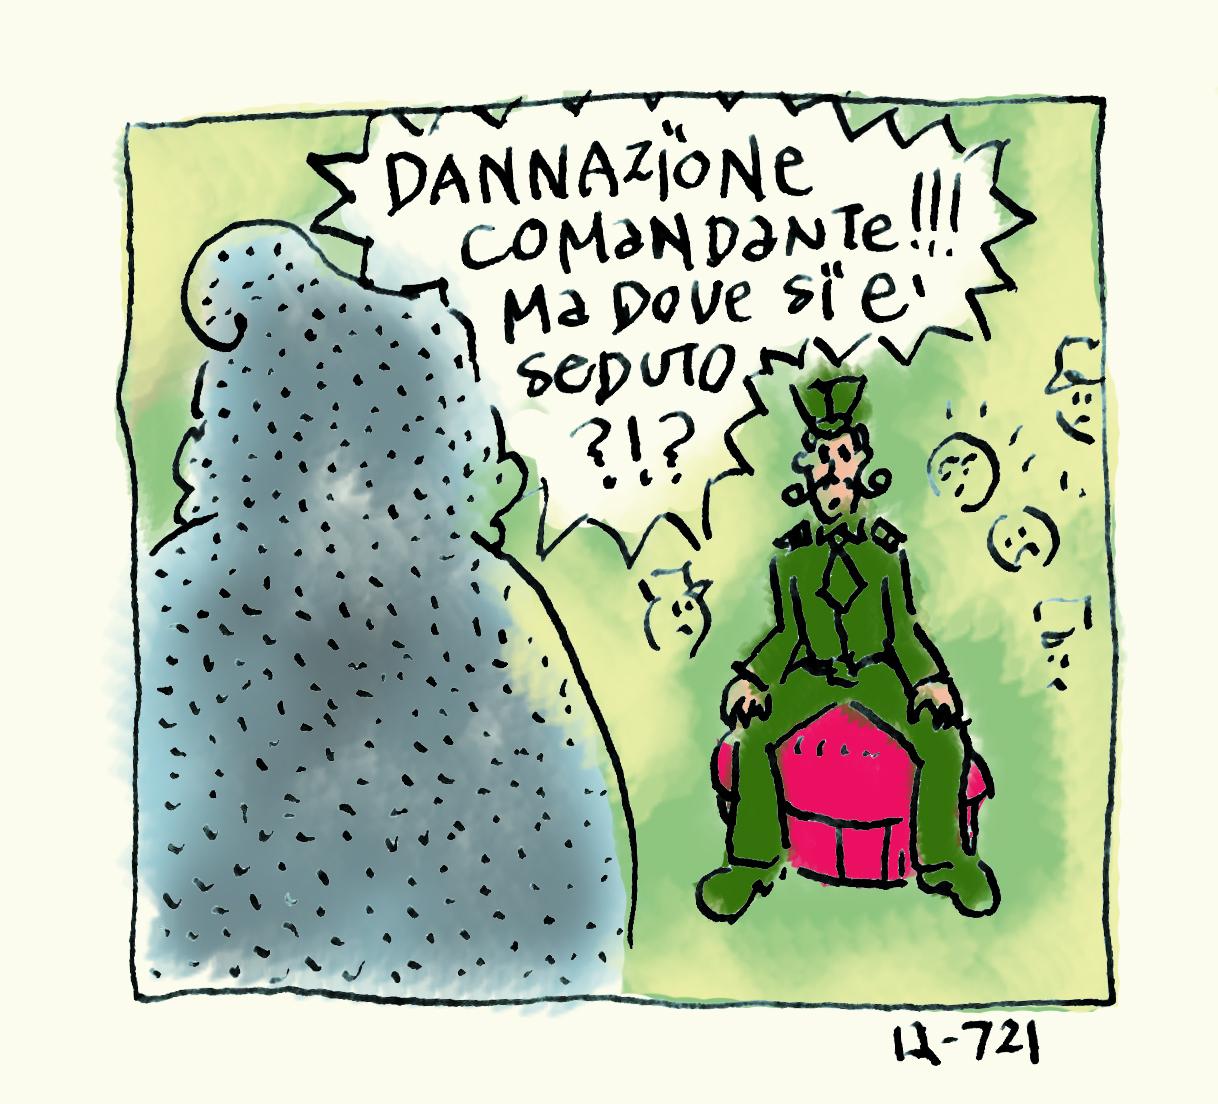 Internet big switch - Q-721 submarine comics